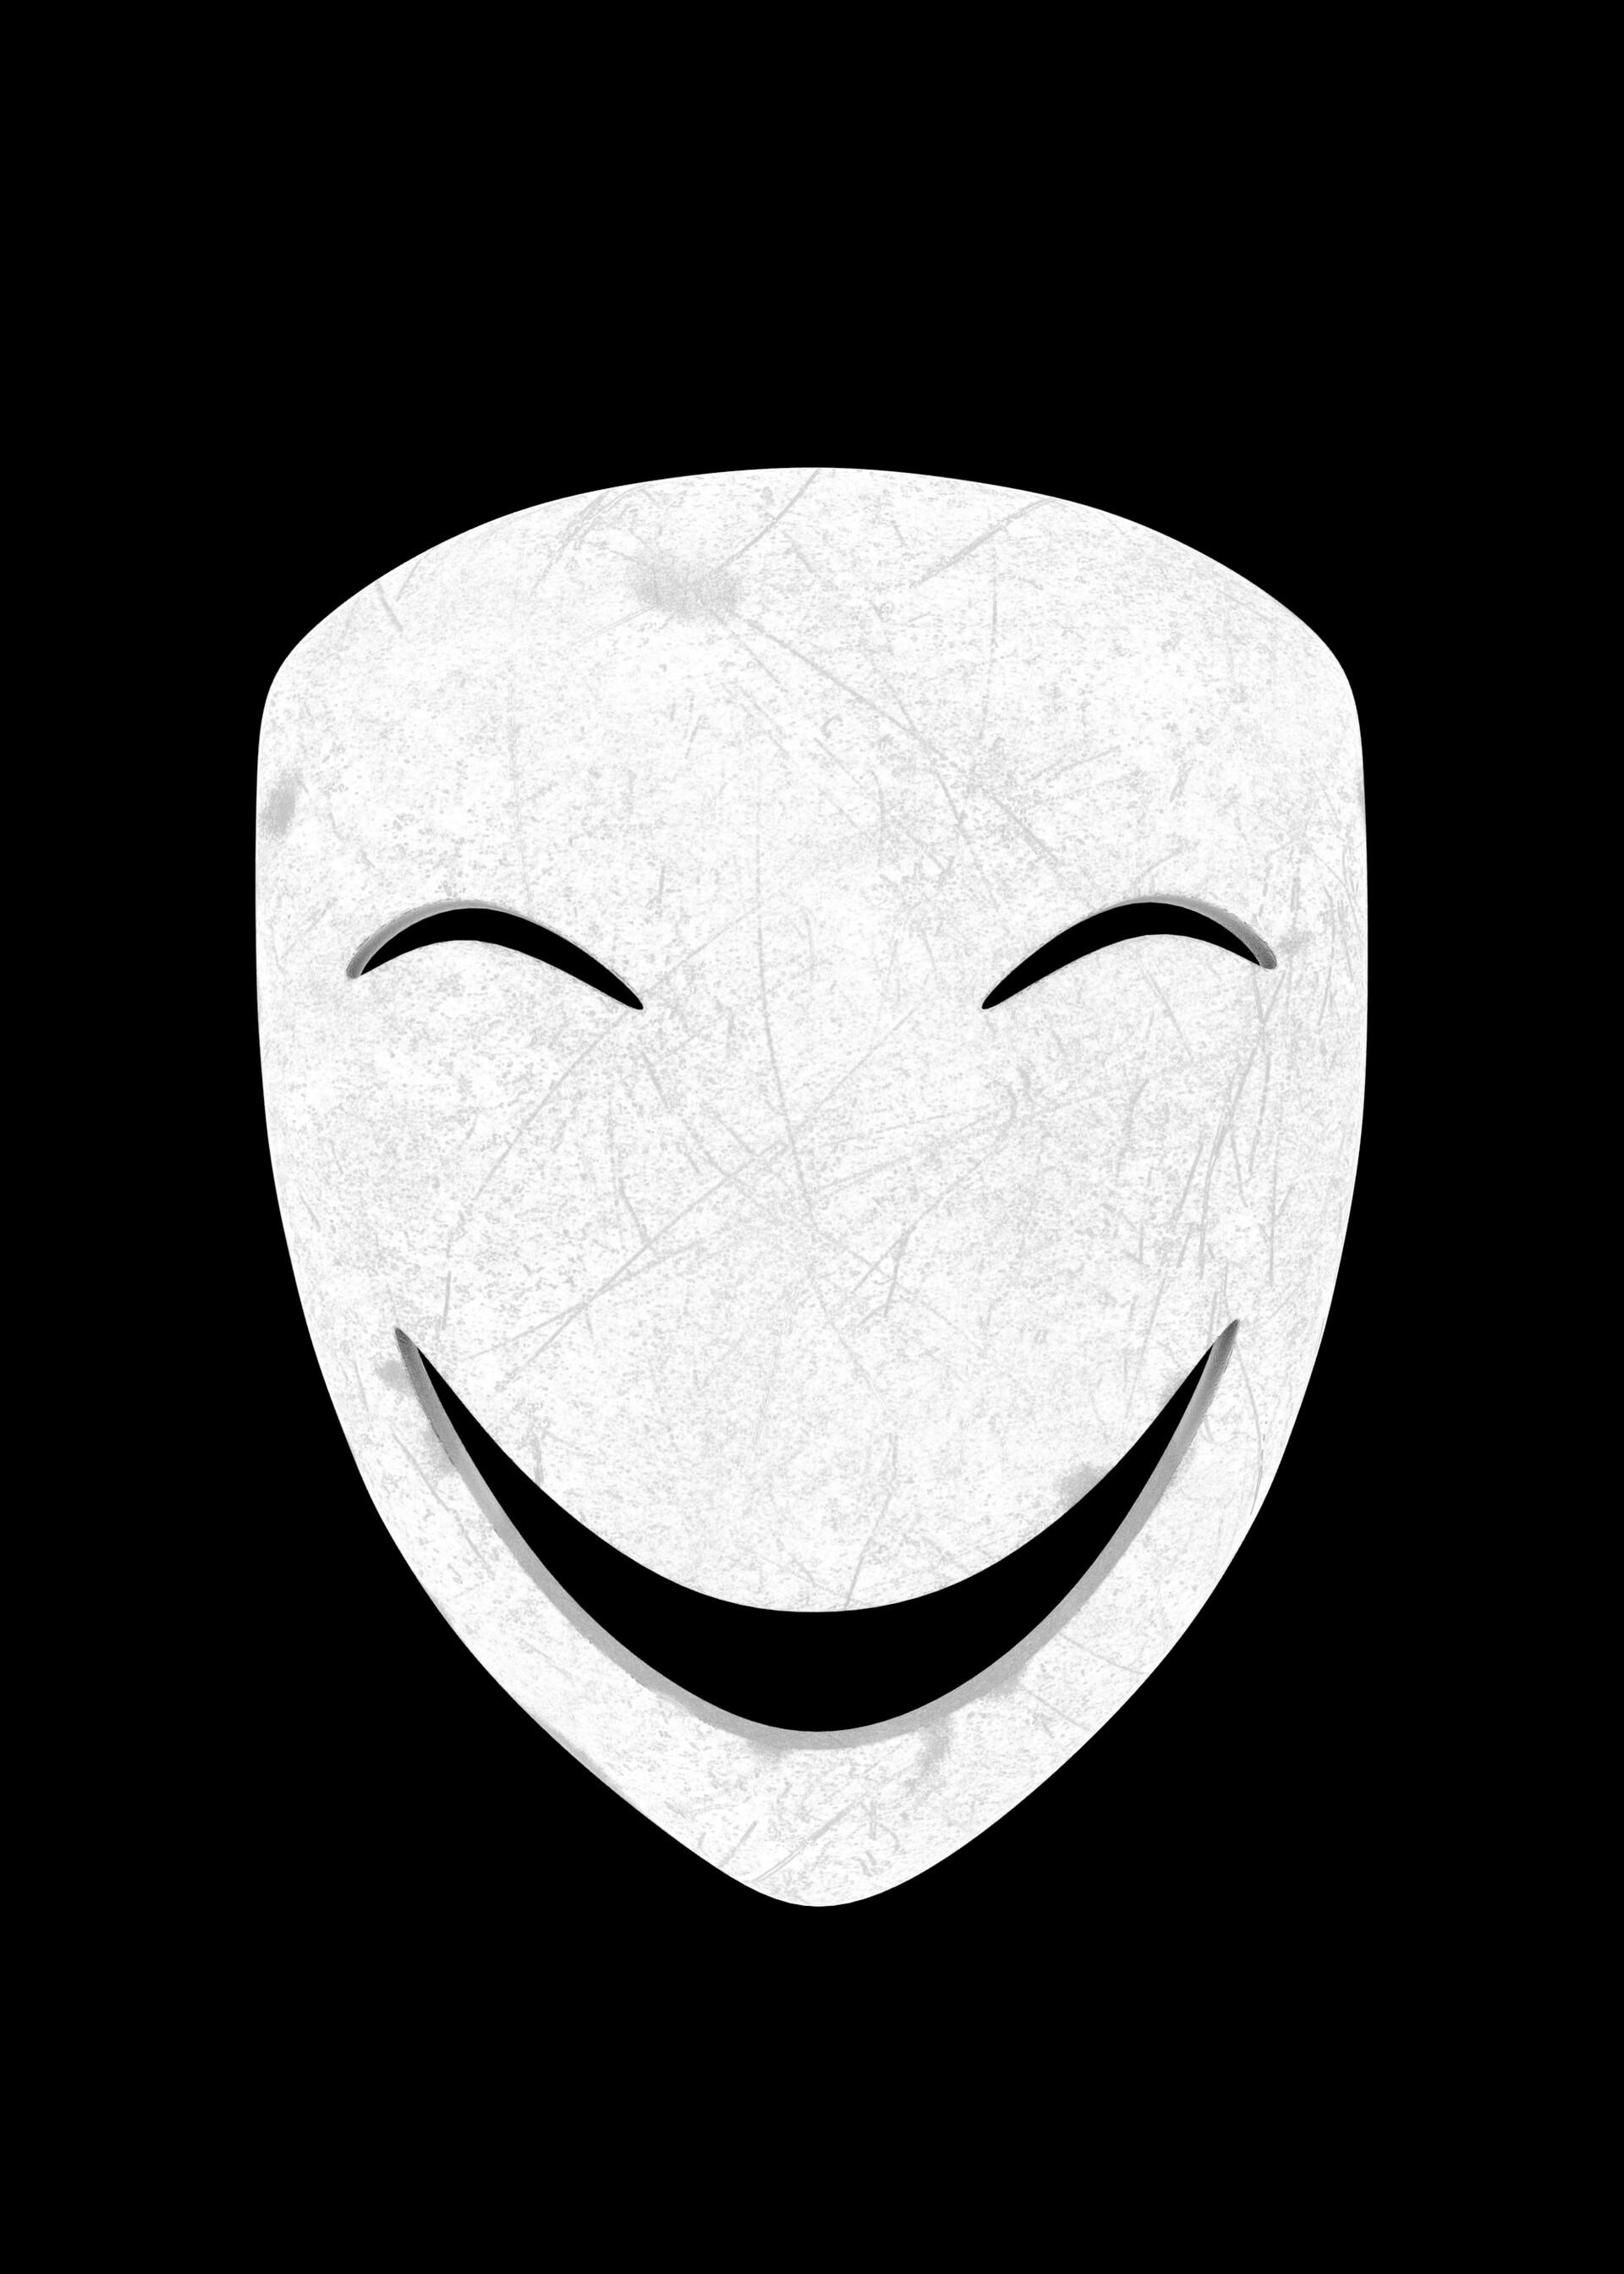 Artstation Kagetane Hiruko S Mask Christopher Sanabria